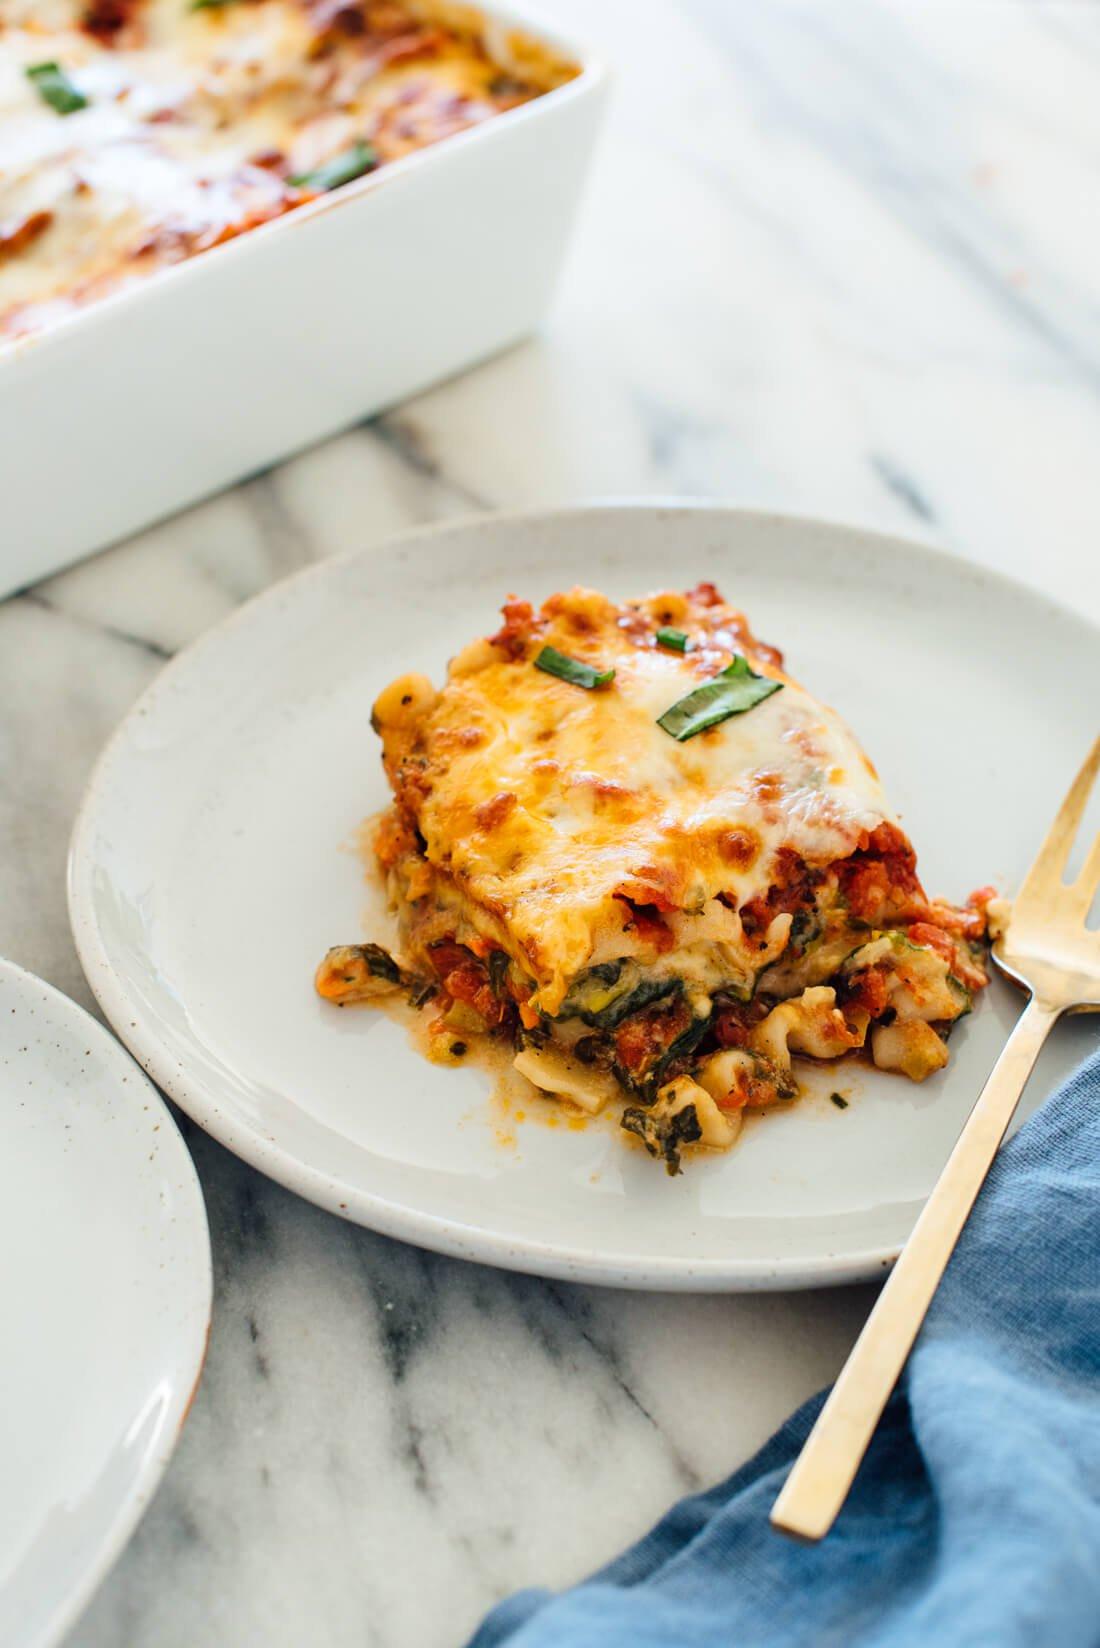 Vegetarian Lasagna Recipes  Best Ve able Lasagna Recipe Cookie and Kate